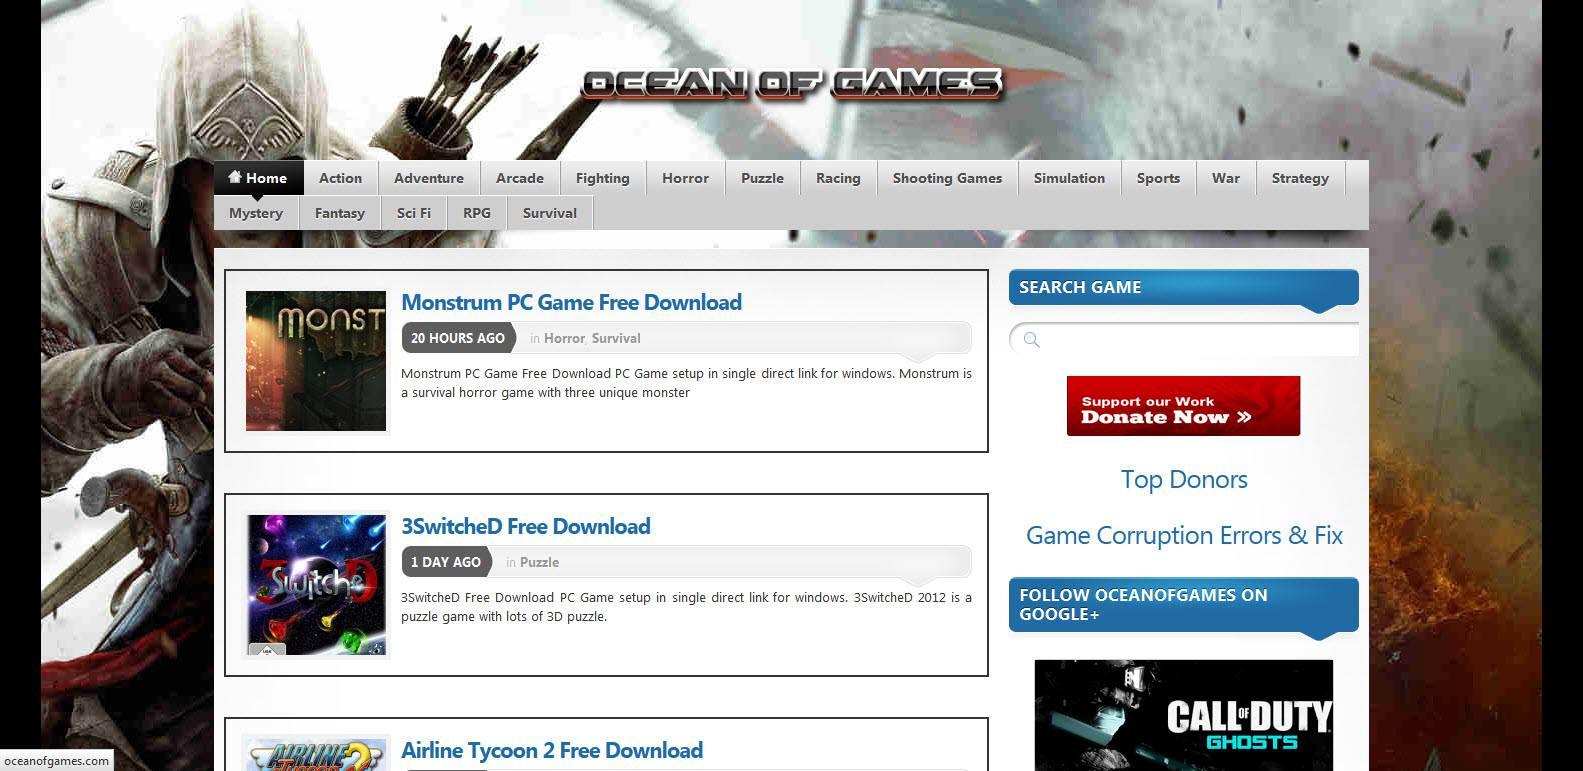 gta 5 free download for windows 10 ocean of games